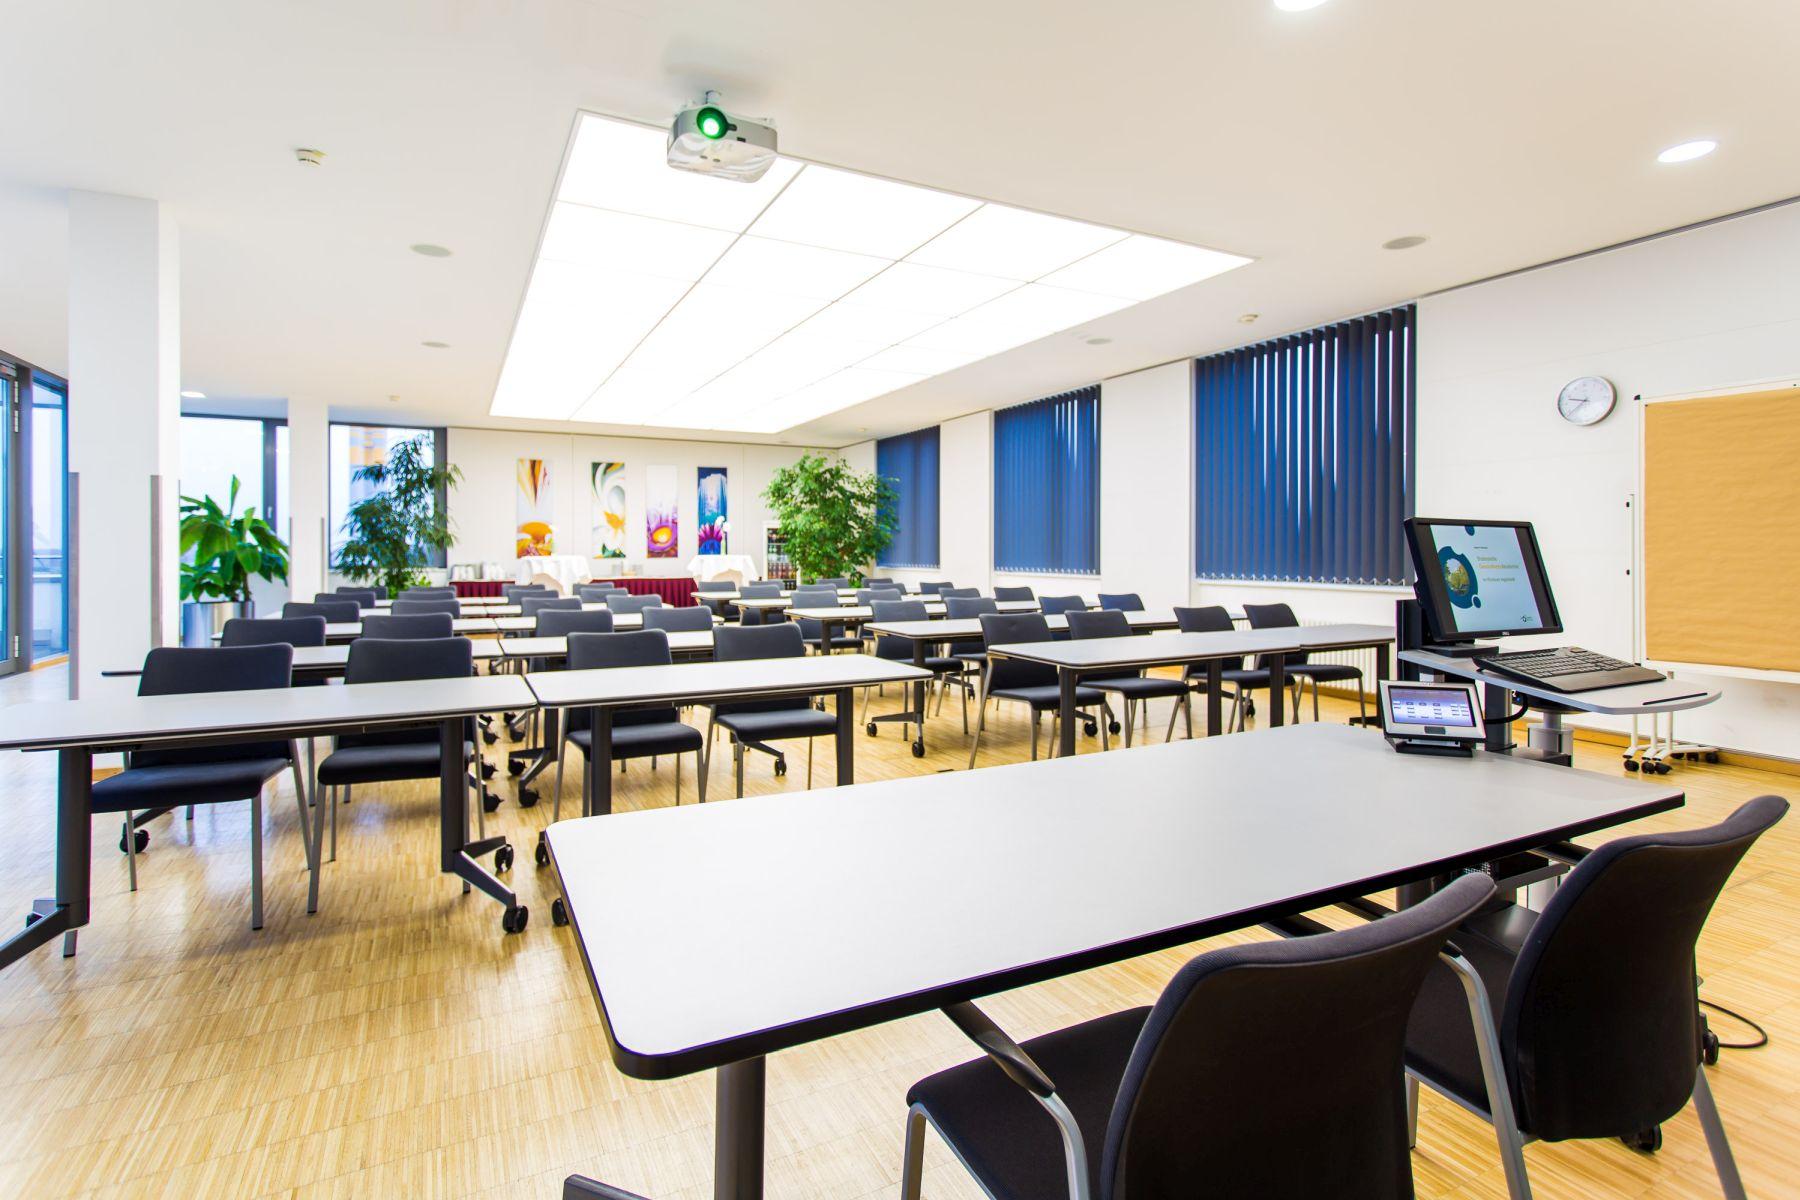 Parkett Ingolstadt parkett ingolstadt kork ingolstadt kaufen bei leitinger gmbh aus